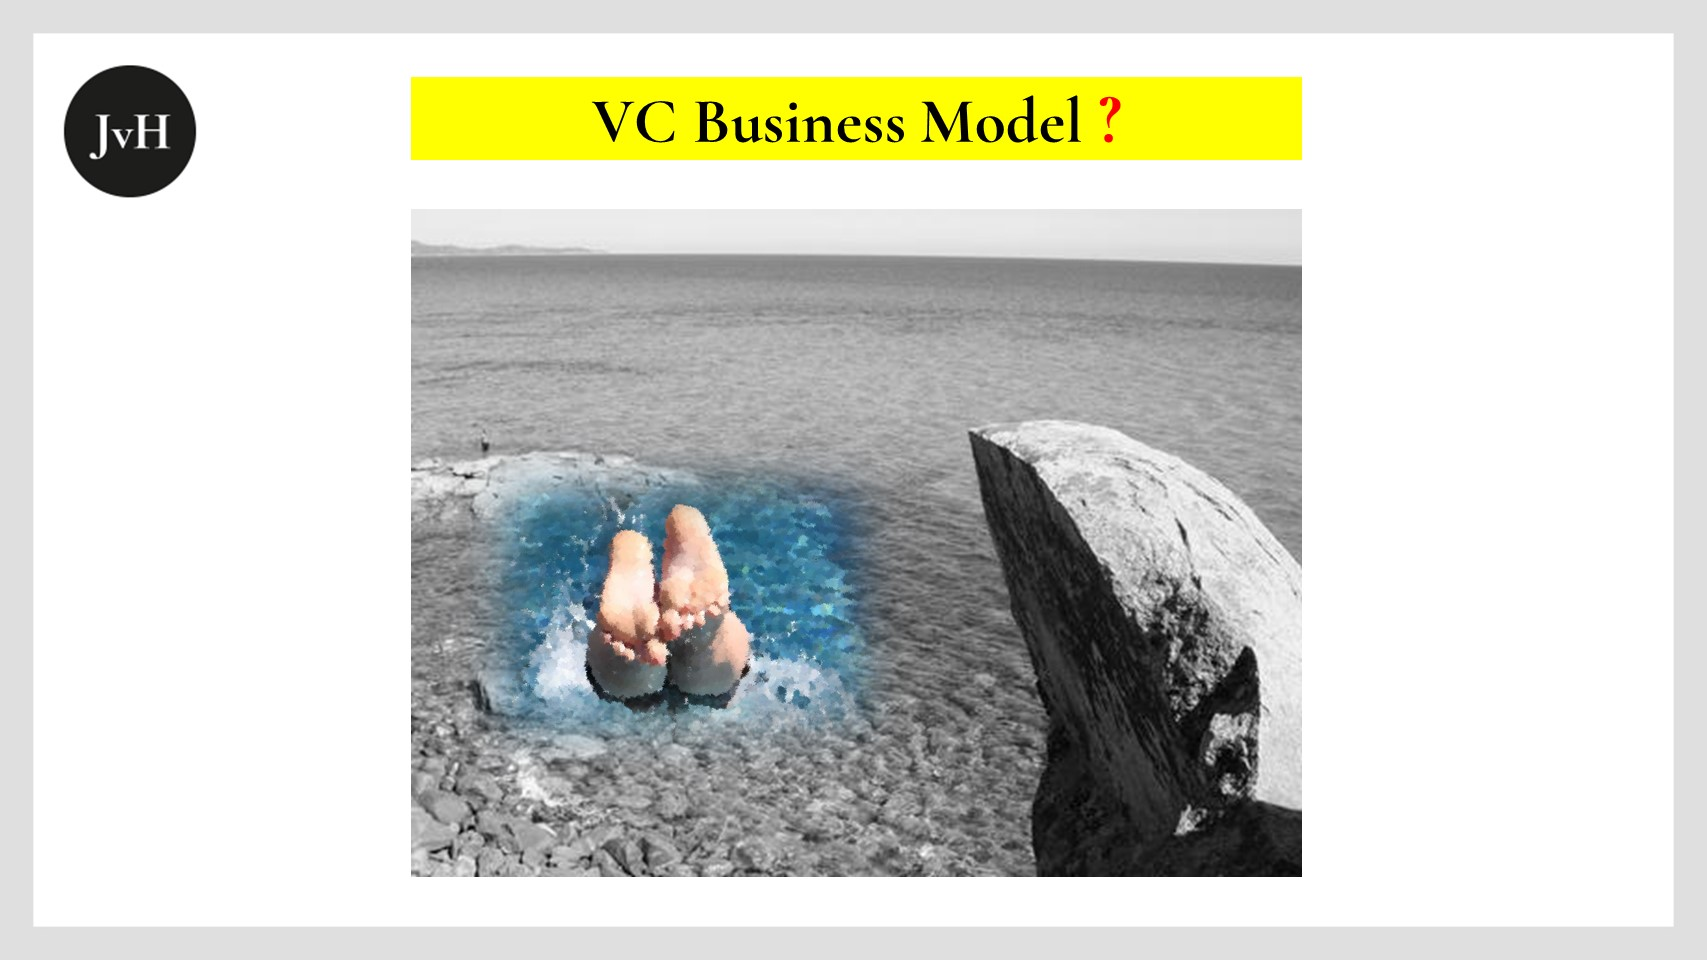 VC-Business-Model- Risk-Distribution-makes-no-Sense for-VCs-and-Angel-Investors